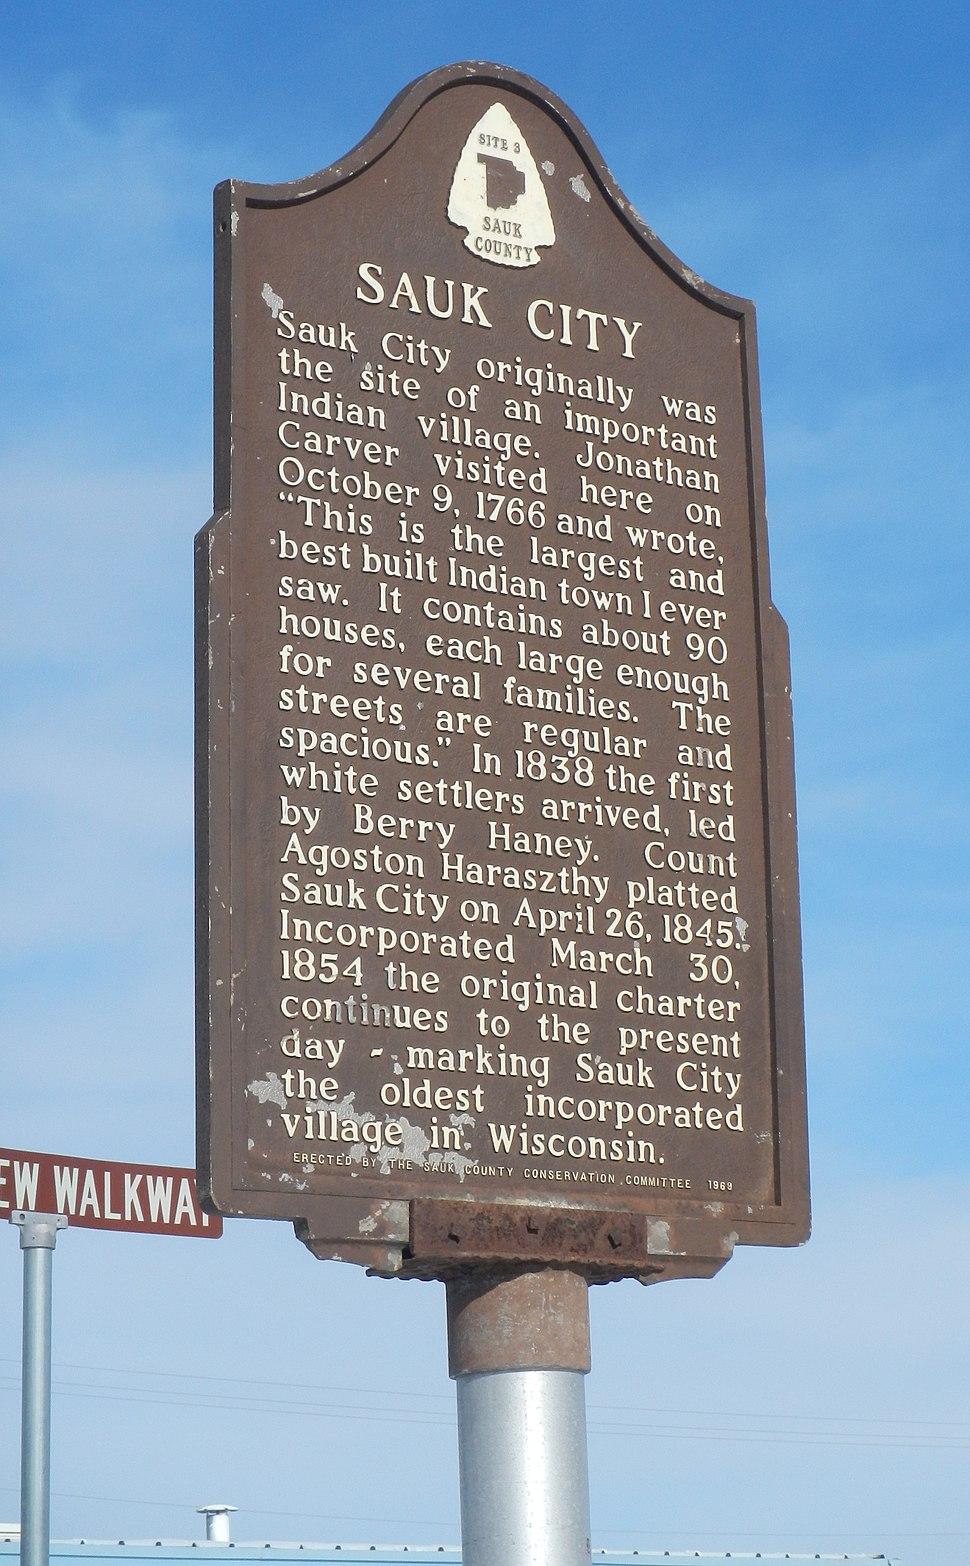 Sauk City historical marker